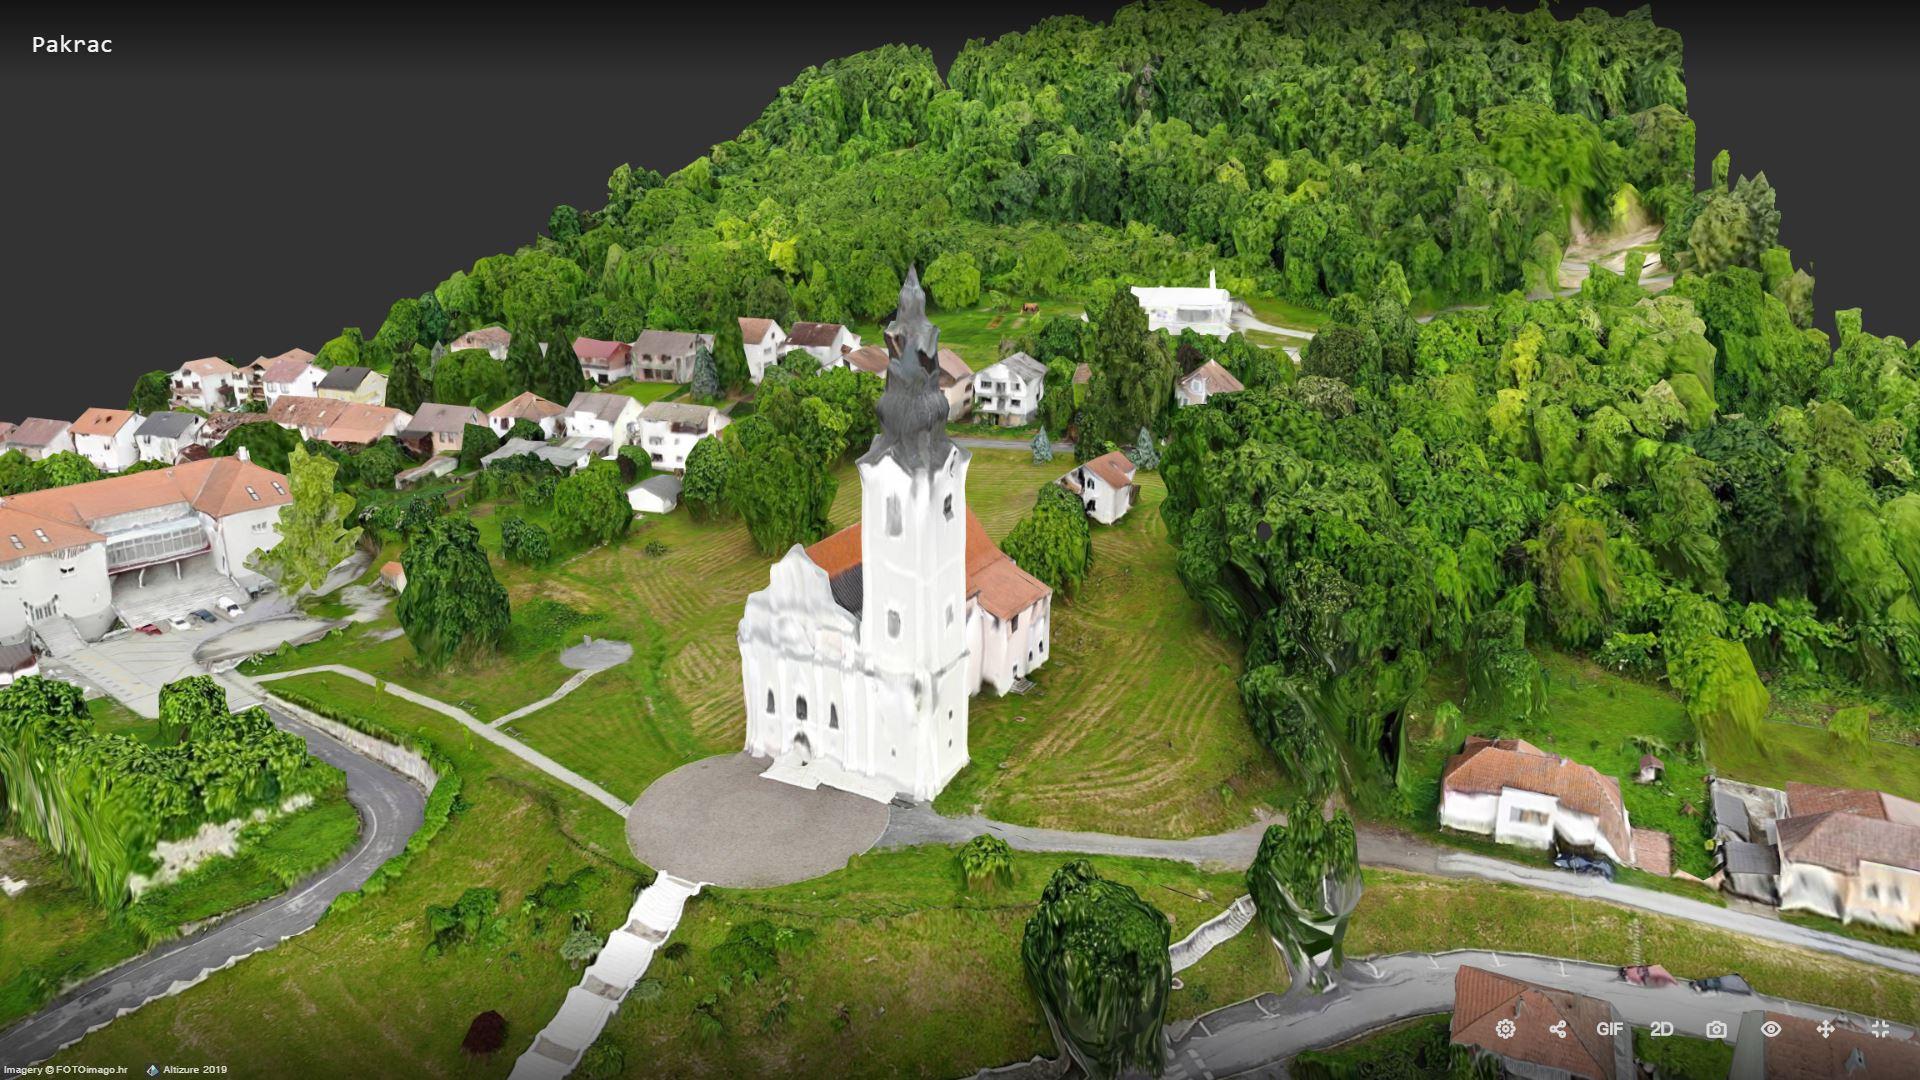 Crkva UBDM Pakrac